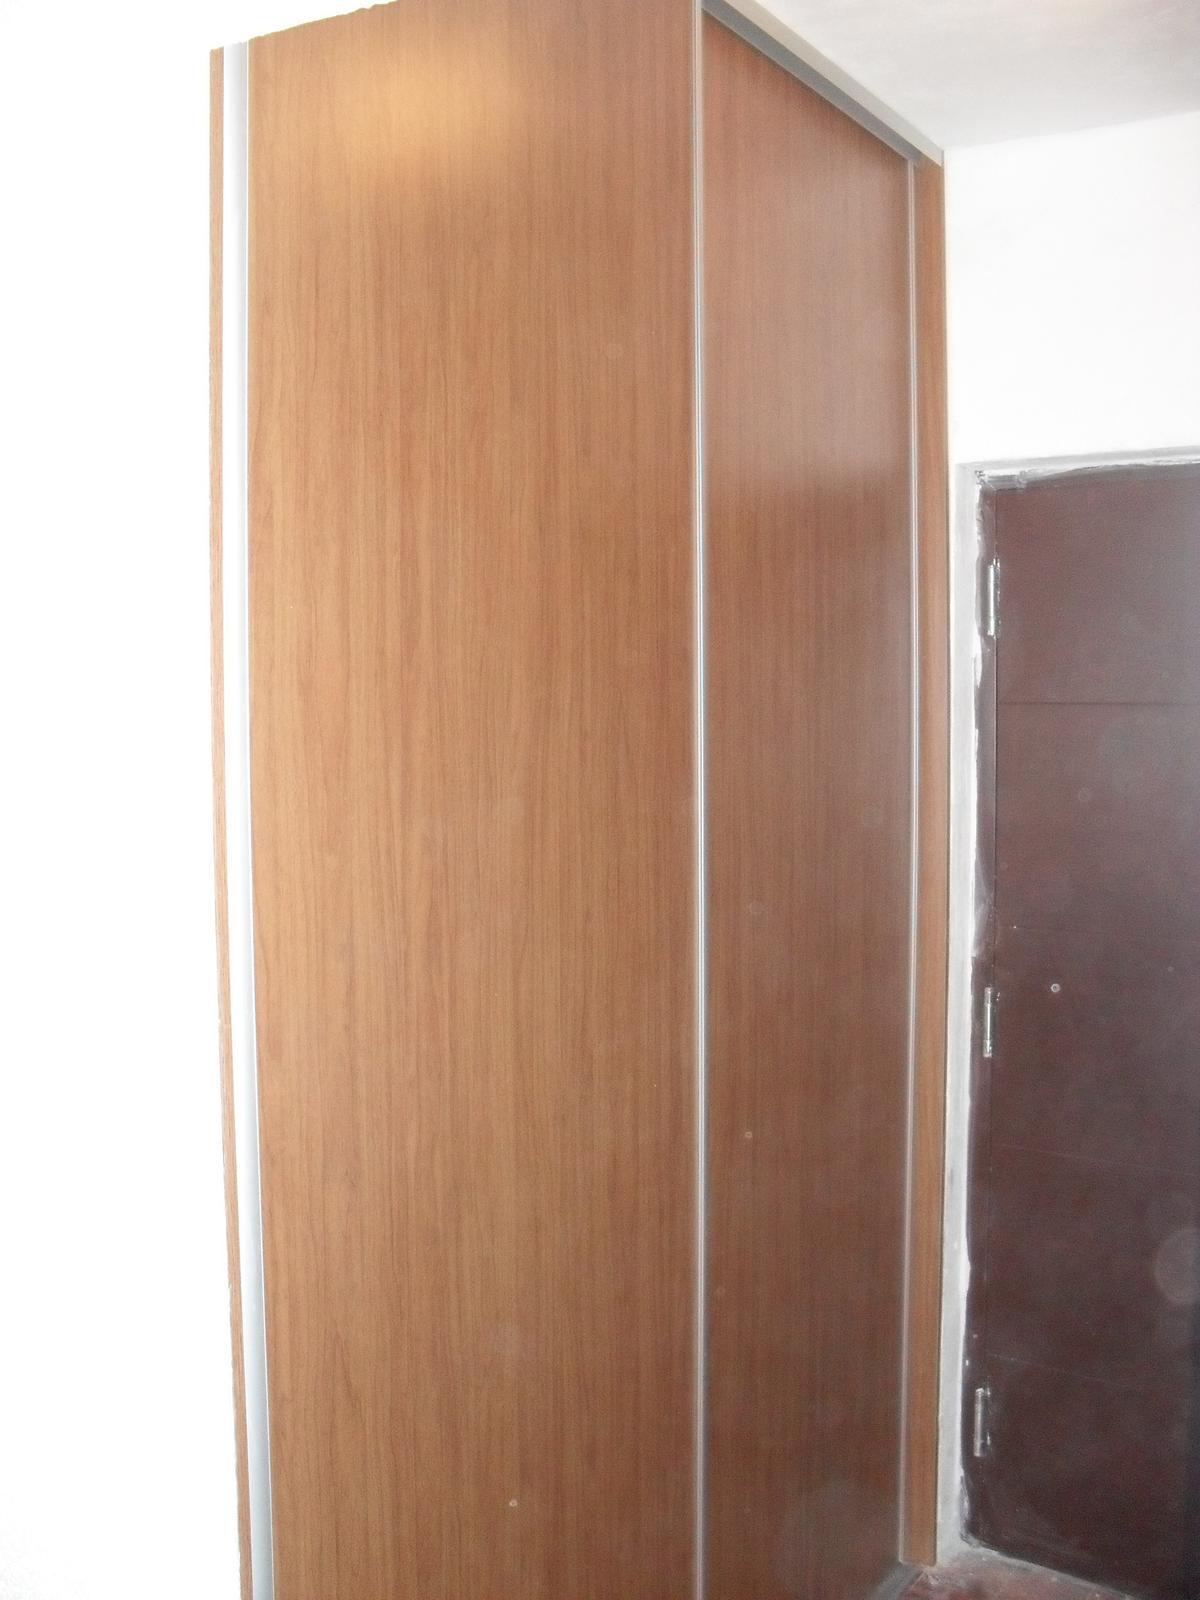 Vstavané skrine Martin Benko Bošany - Obrázok č. 56